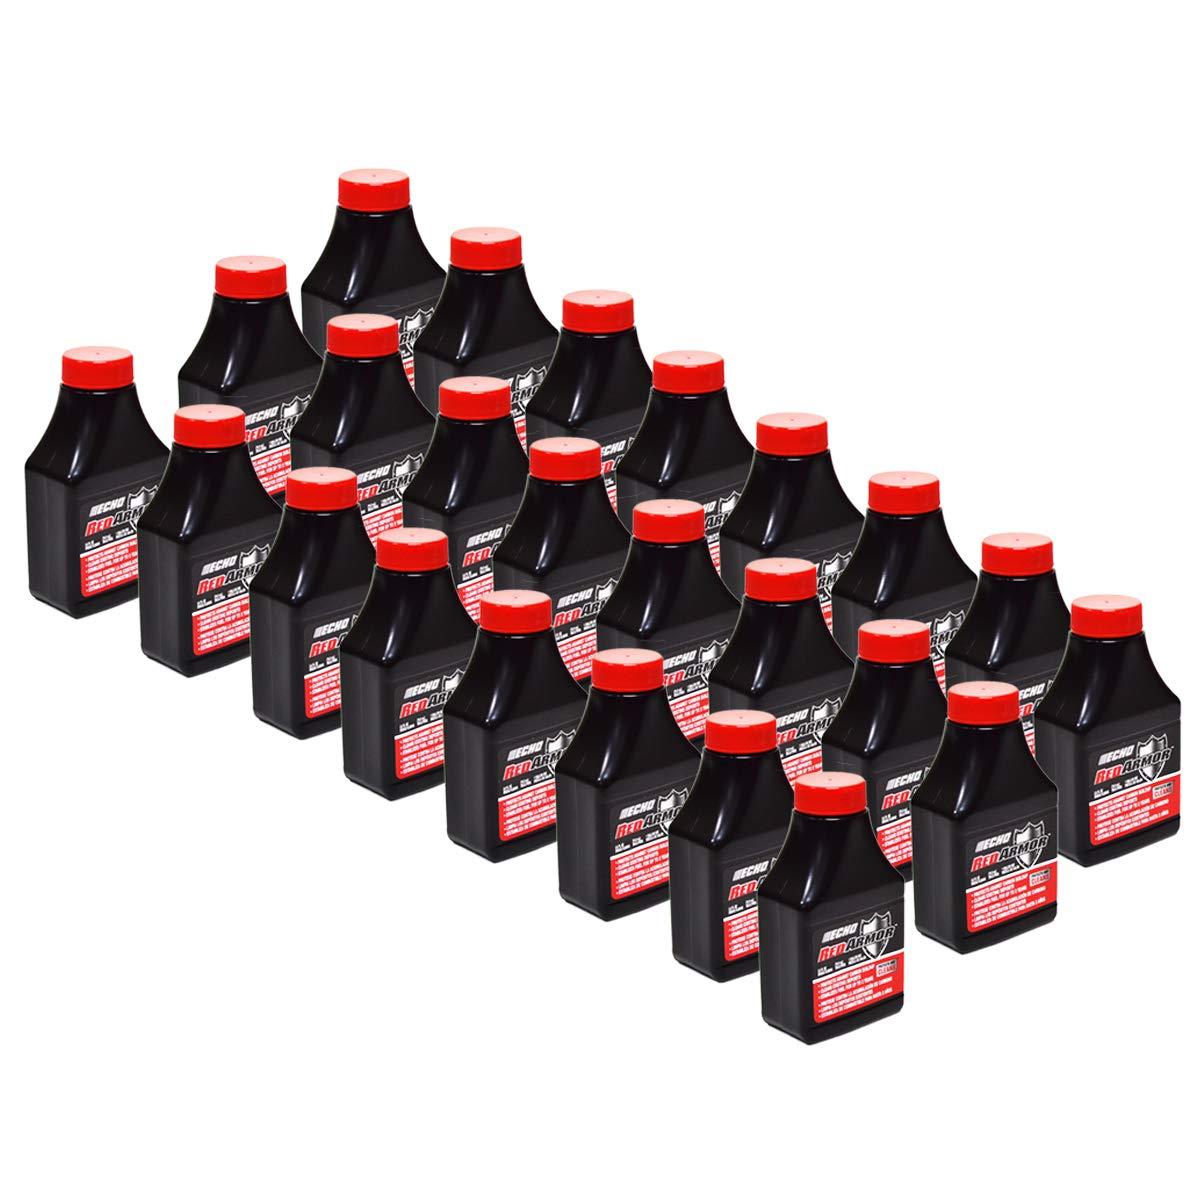 (24) Genuine OEM Echo Red Armor 1 Gallon Mix of 2-Cycle Oil 2.6oz 2.6 oz 6550000